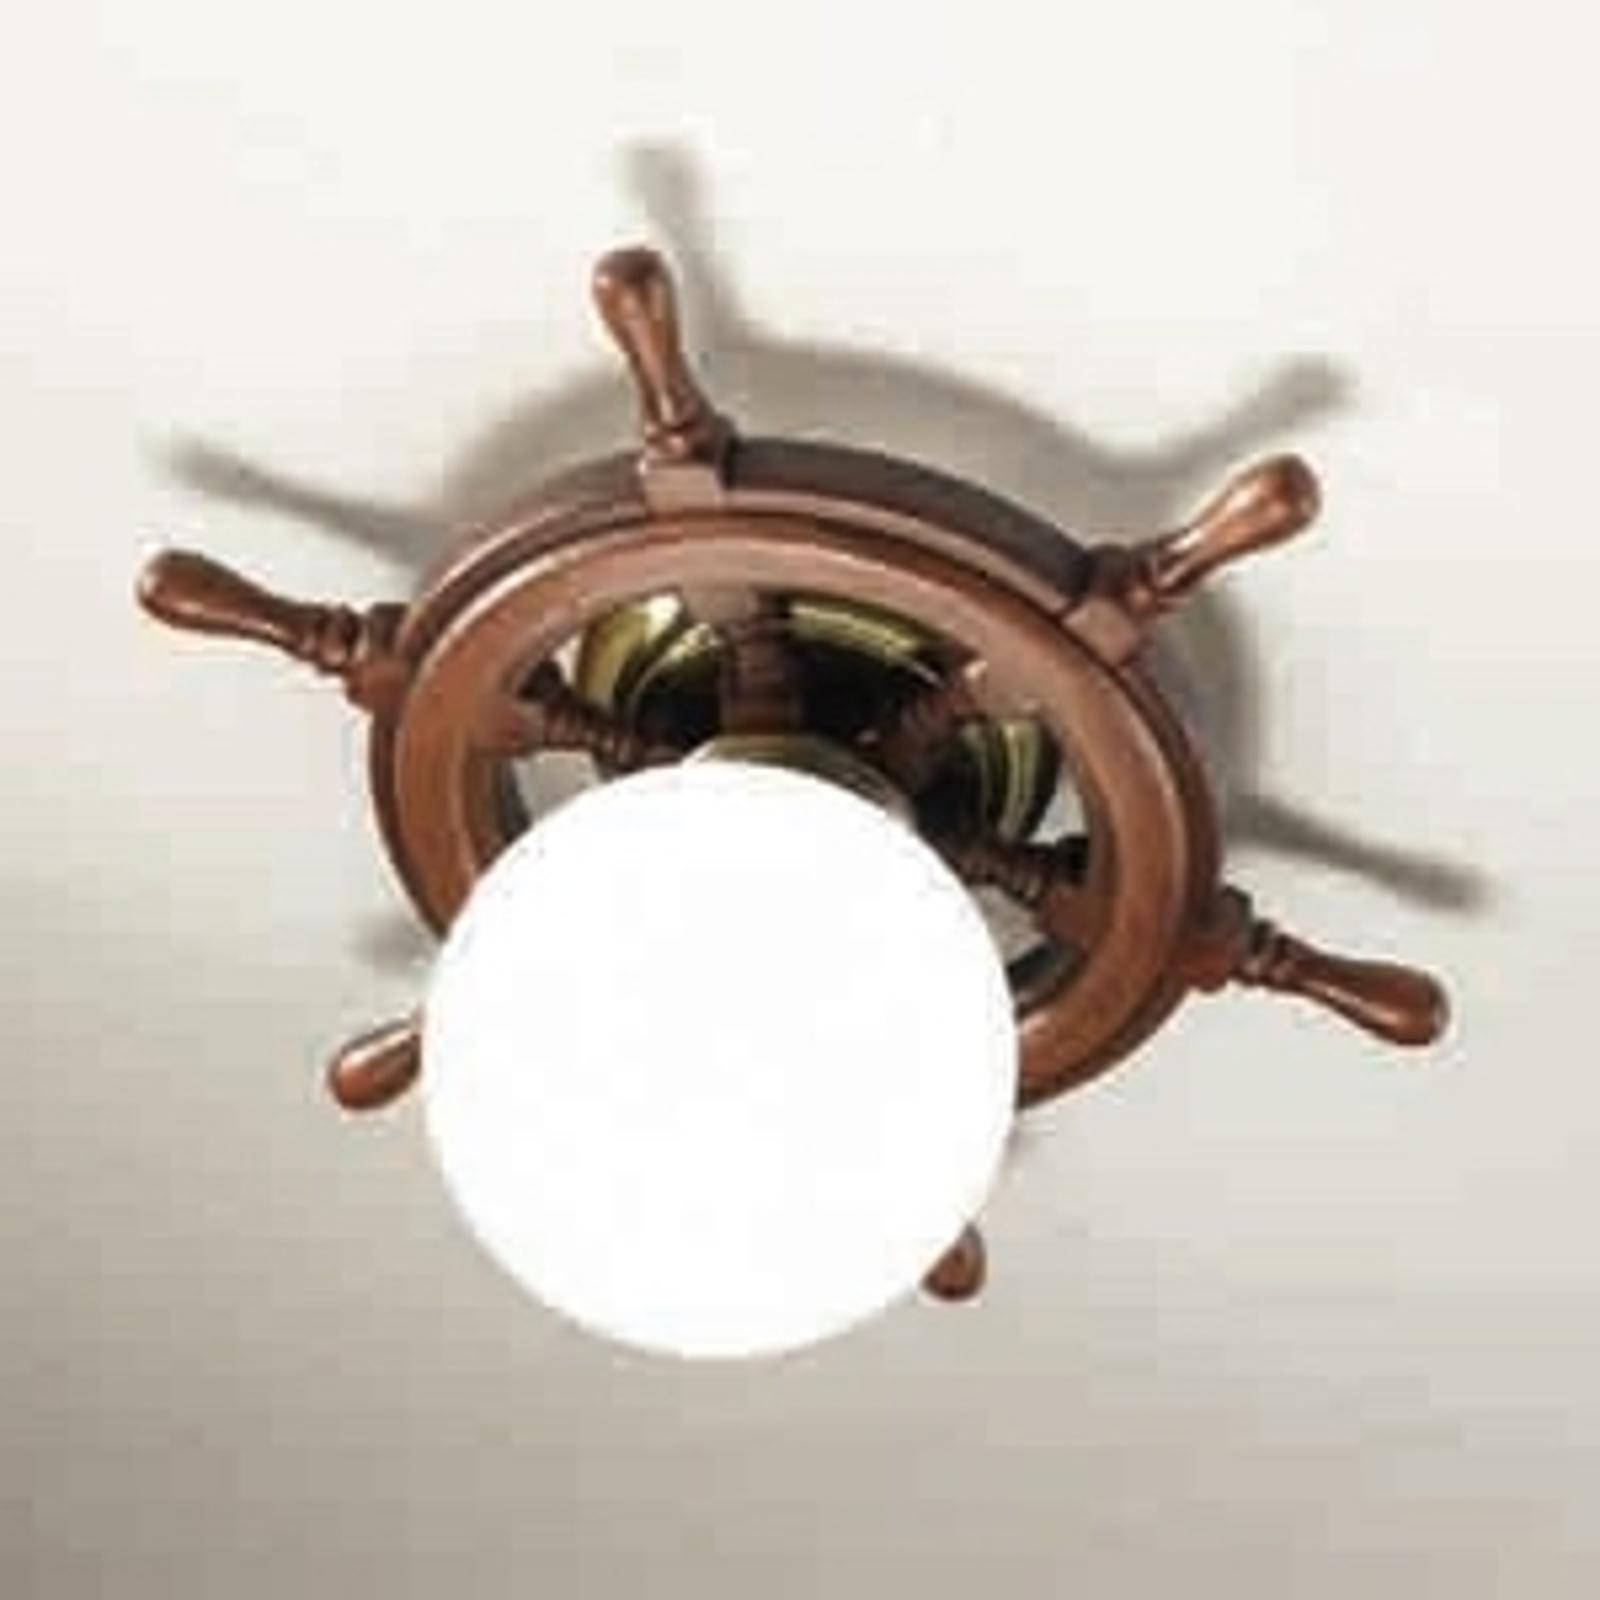 Flot Timone loftlampe, hvidt kugleglas